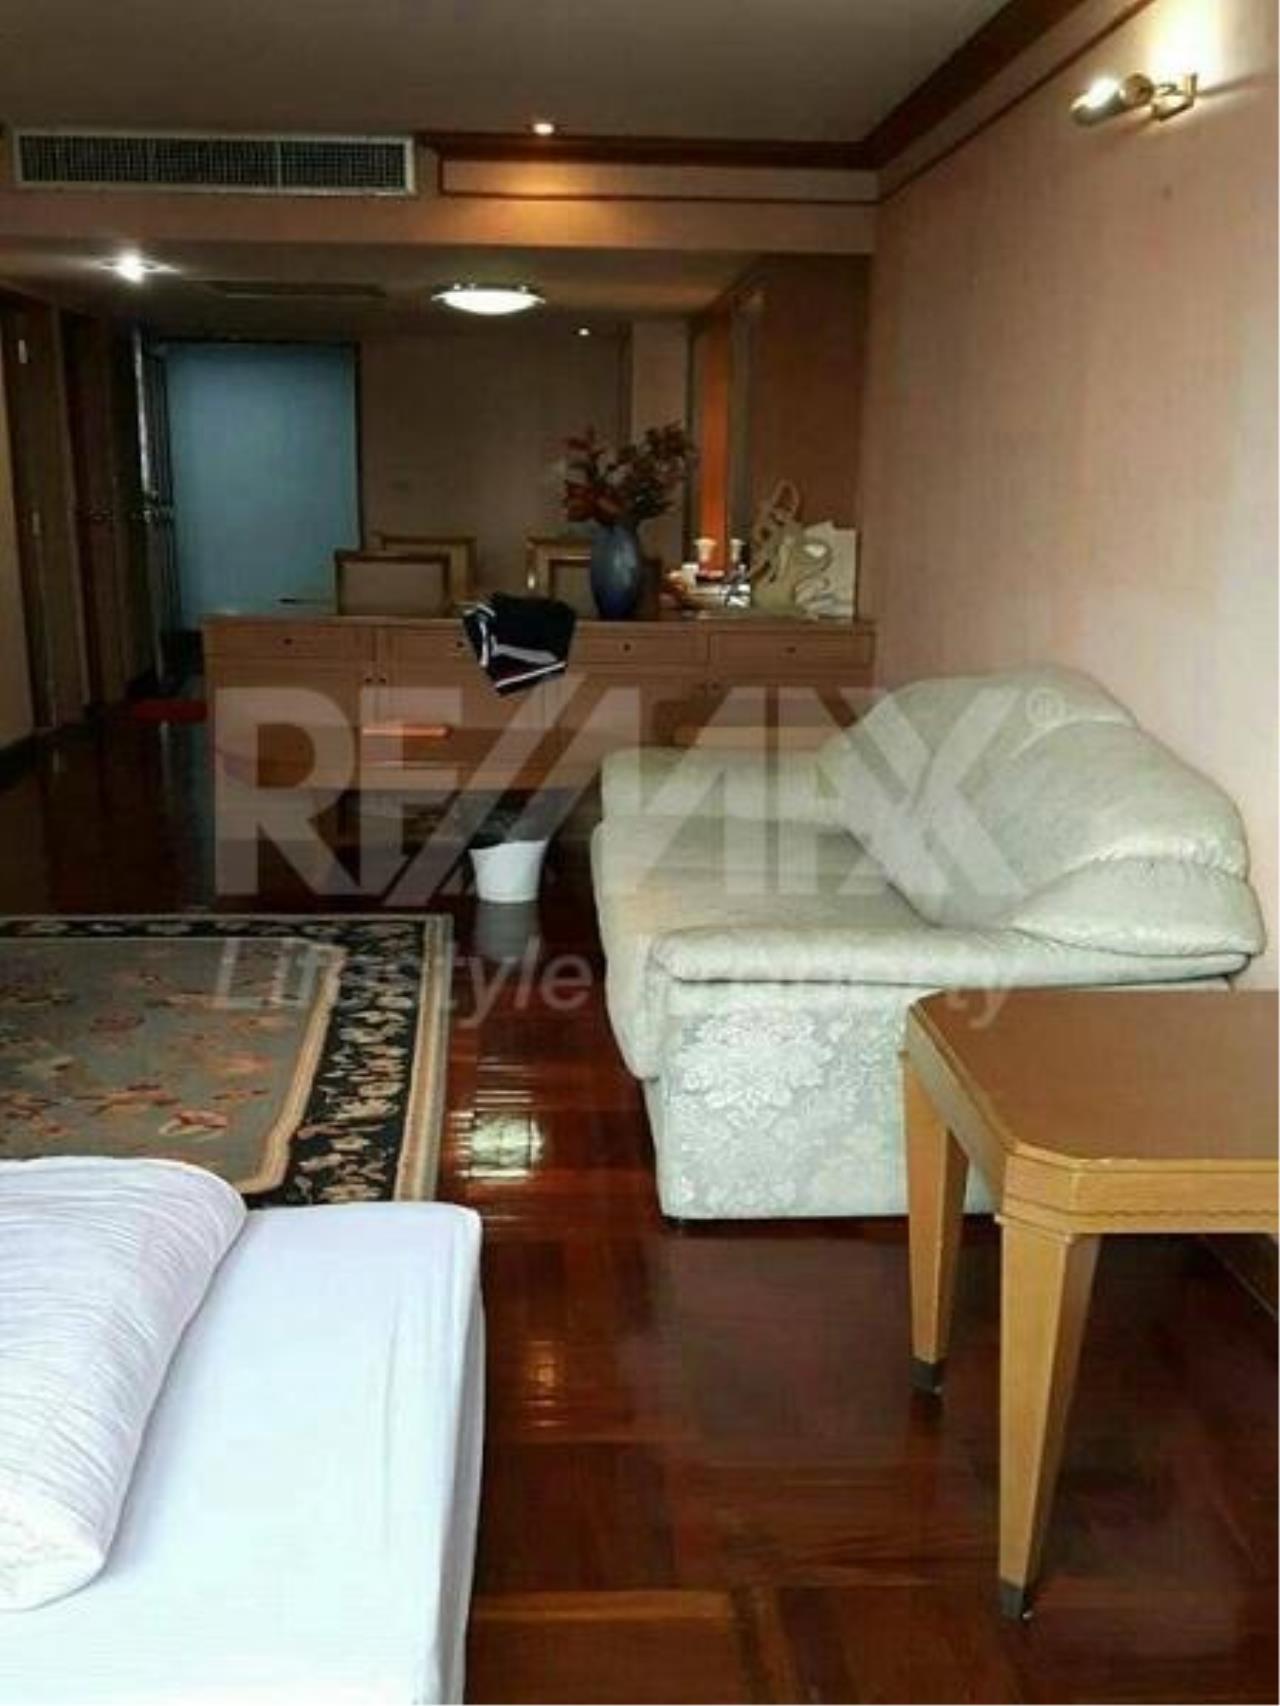 RE/MAX LifeStyle Property Agency's Omni Tower Sukhumvit Nana 13